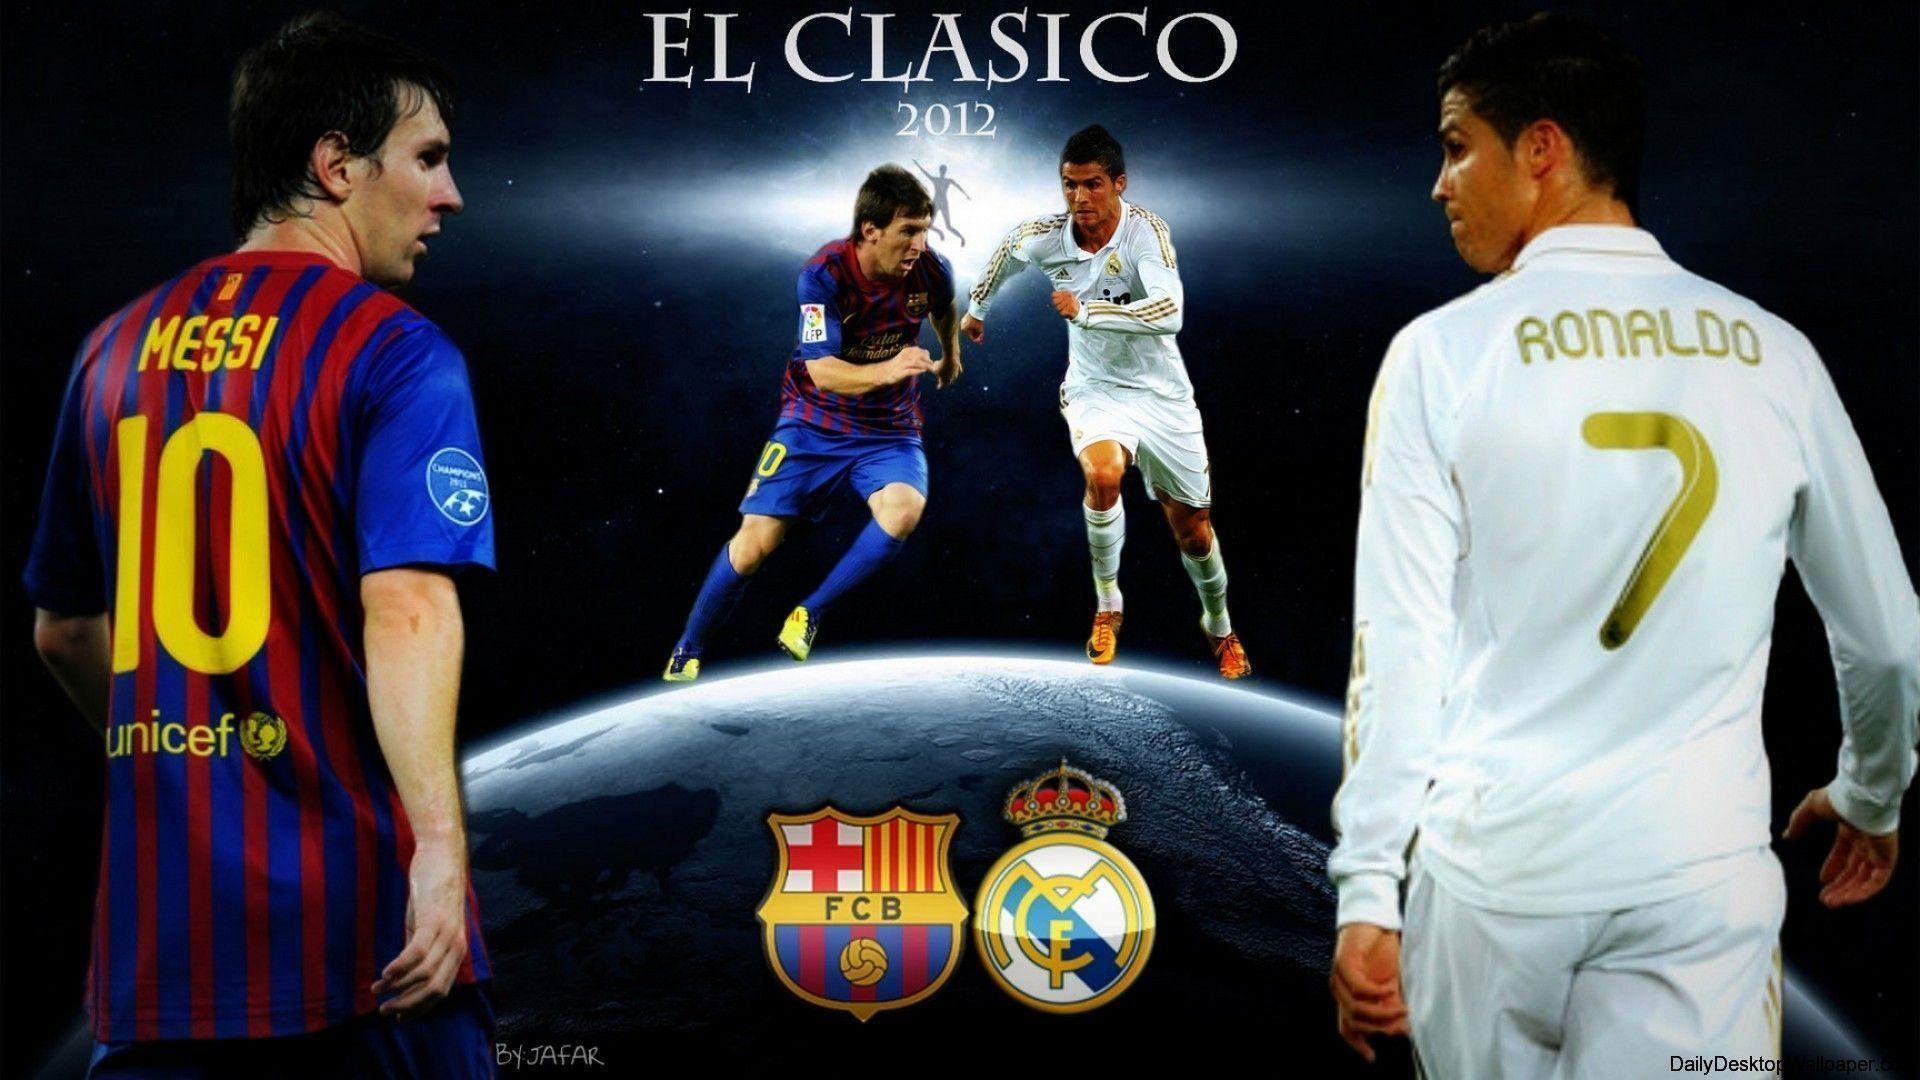 Messi Vs Ronaldo Wallpaper 2018 Hd 70 Pictures